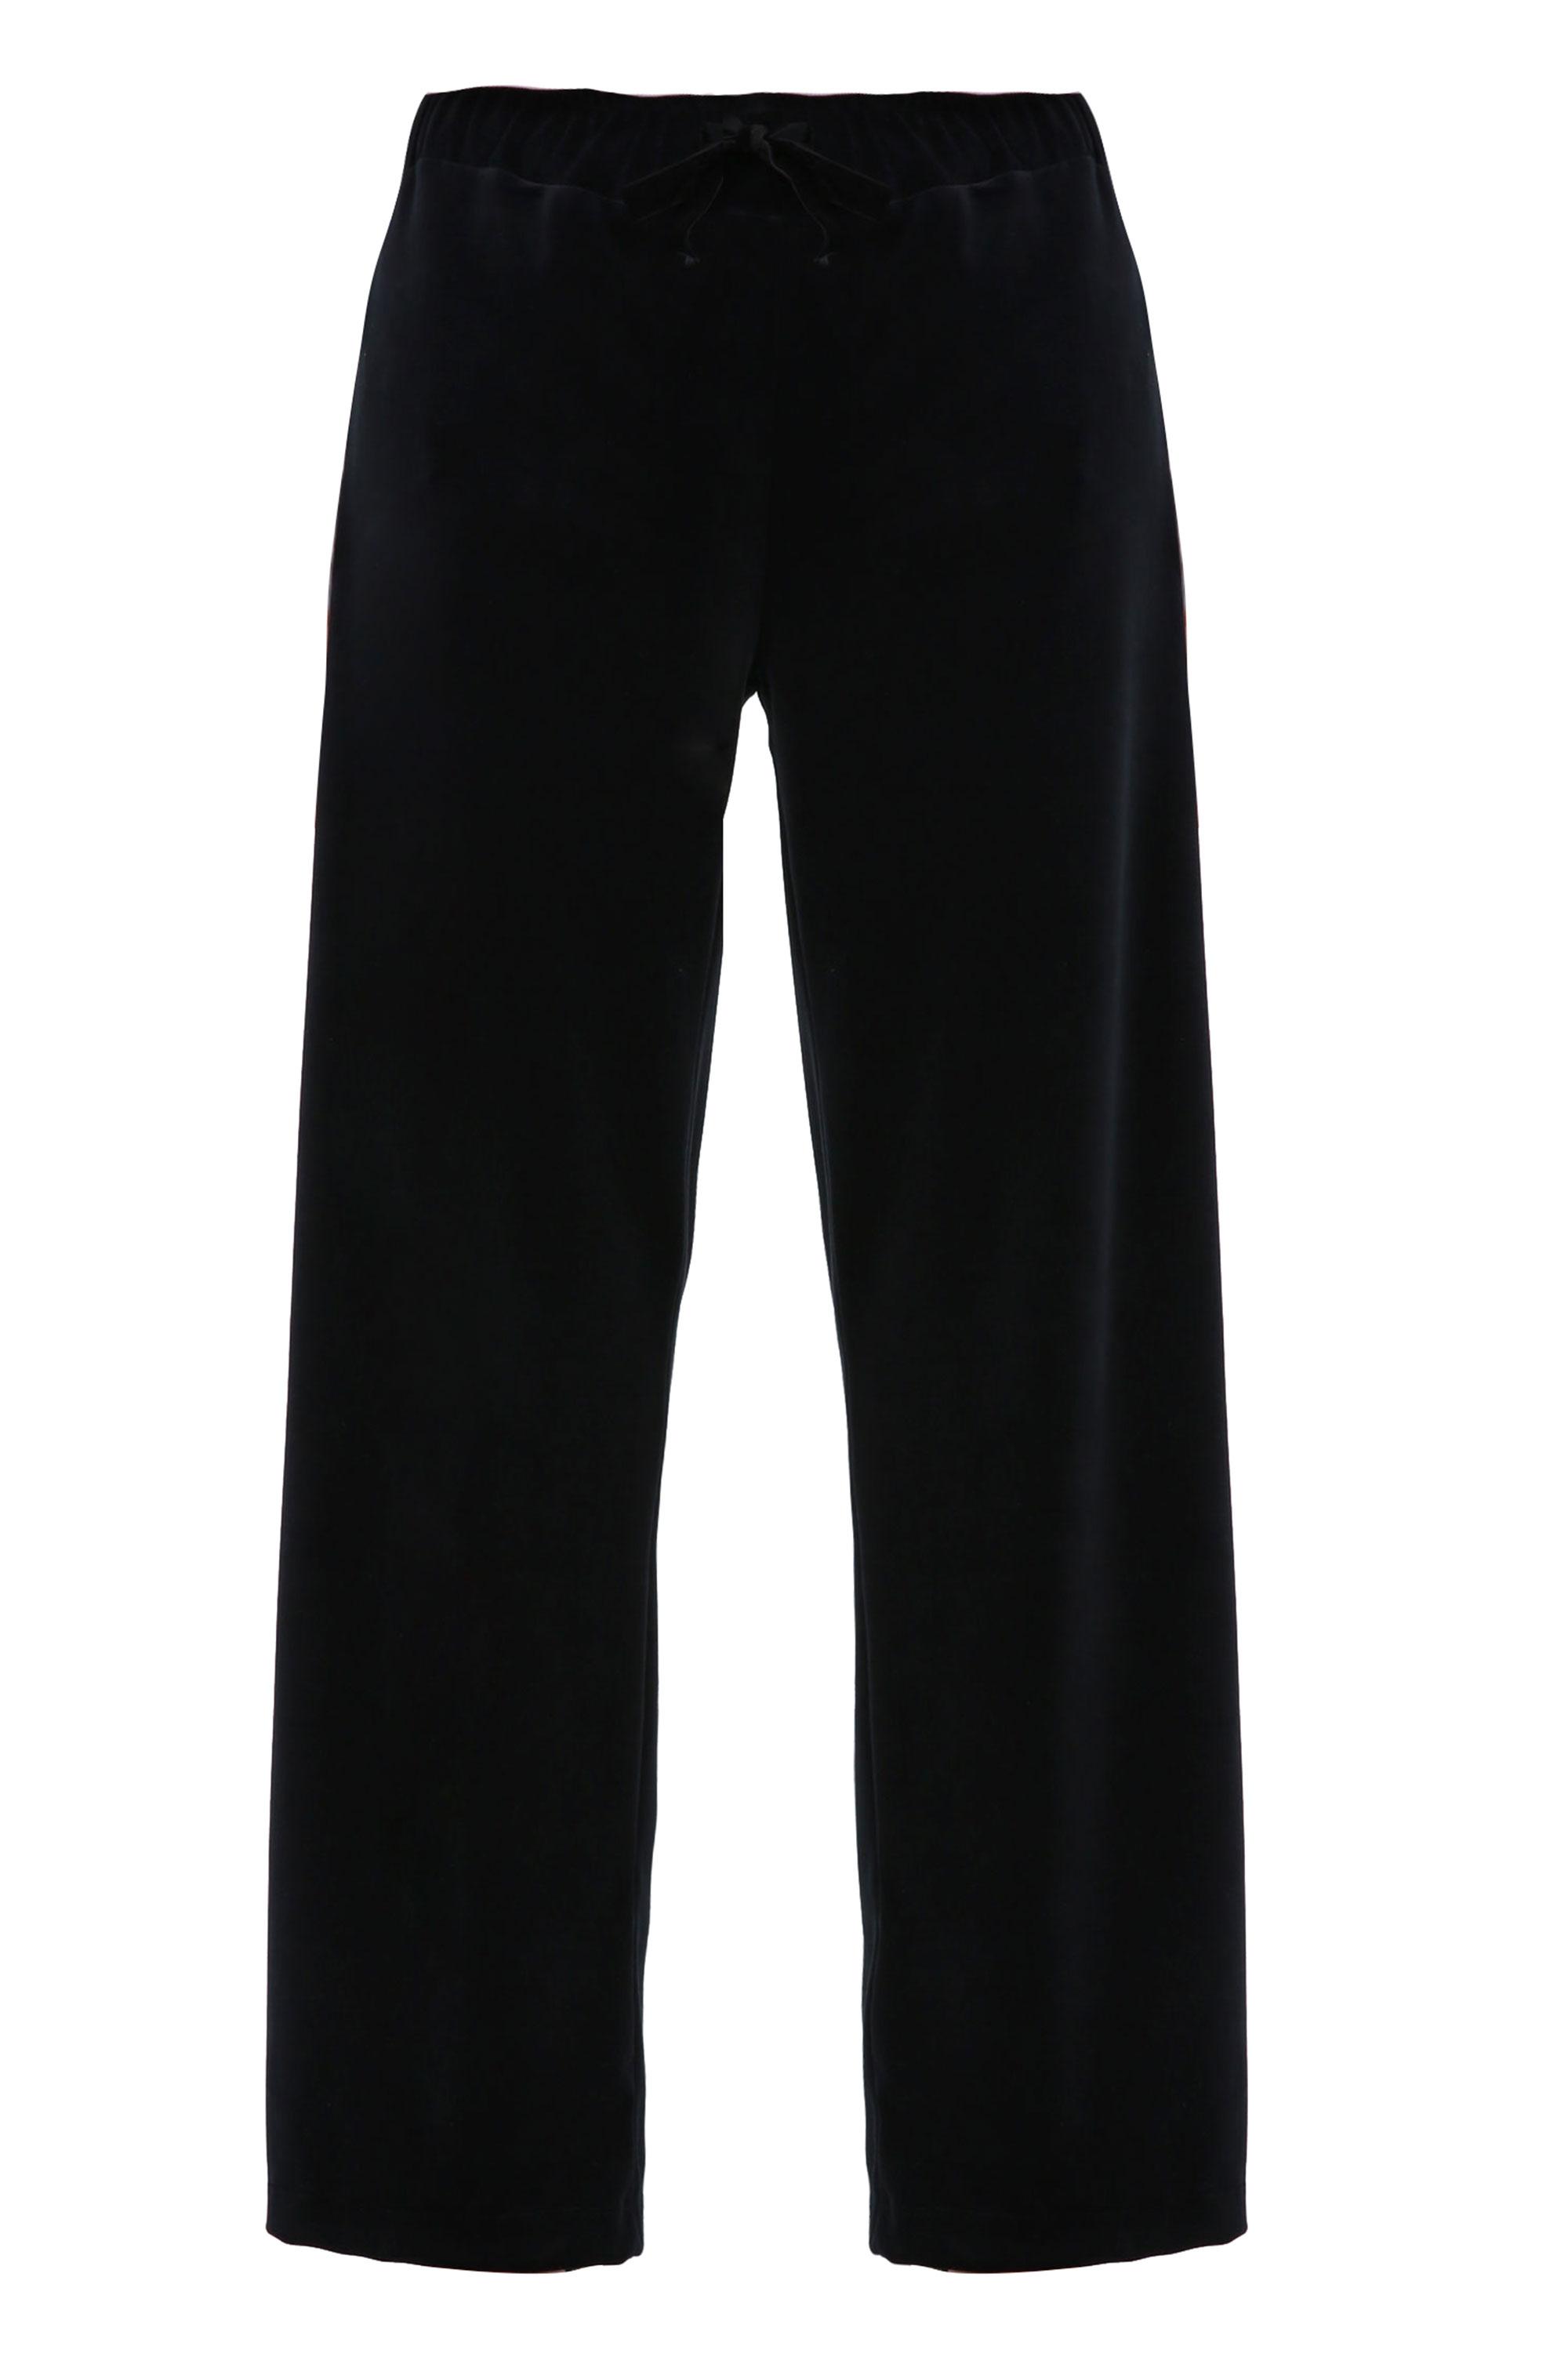 Spodnie - 3404 NERO - Unisono